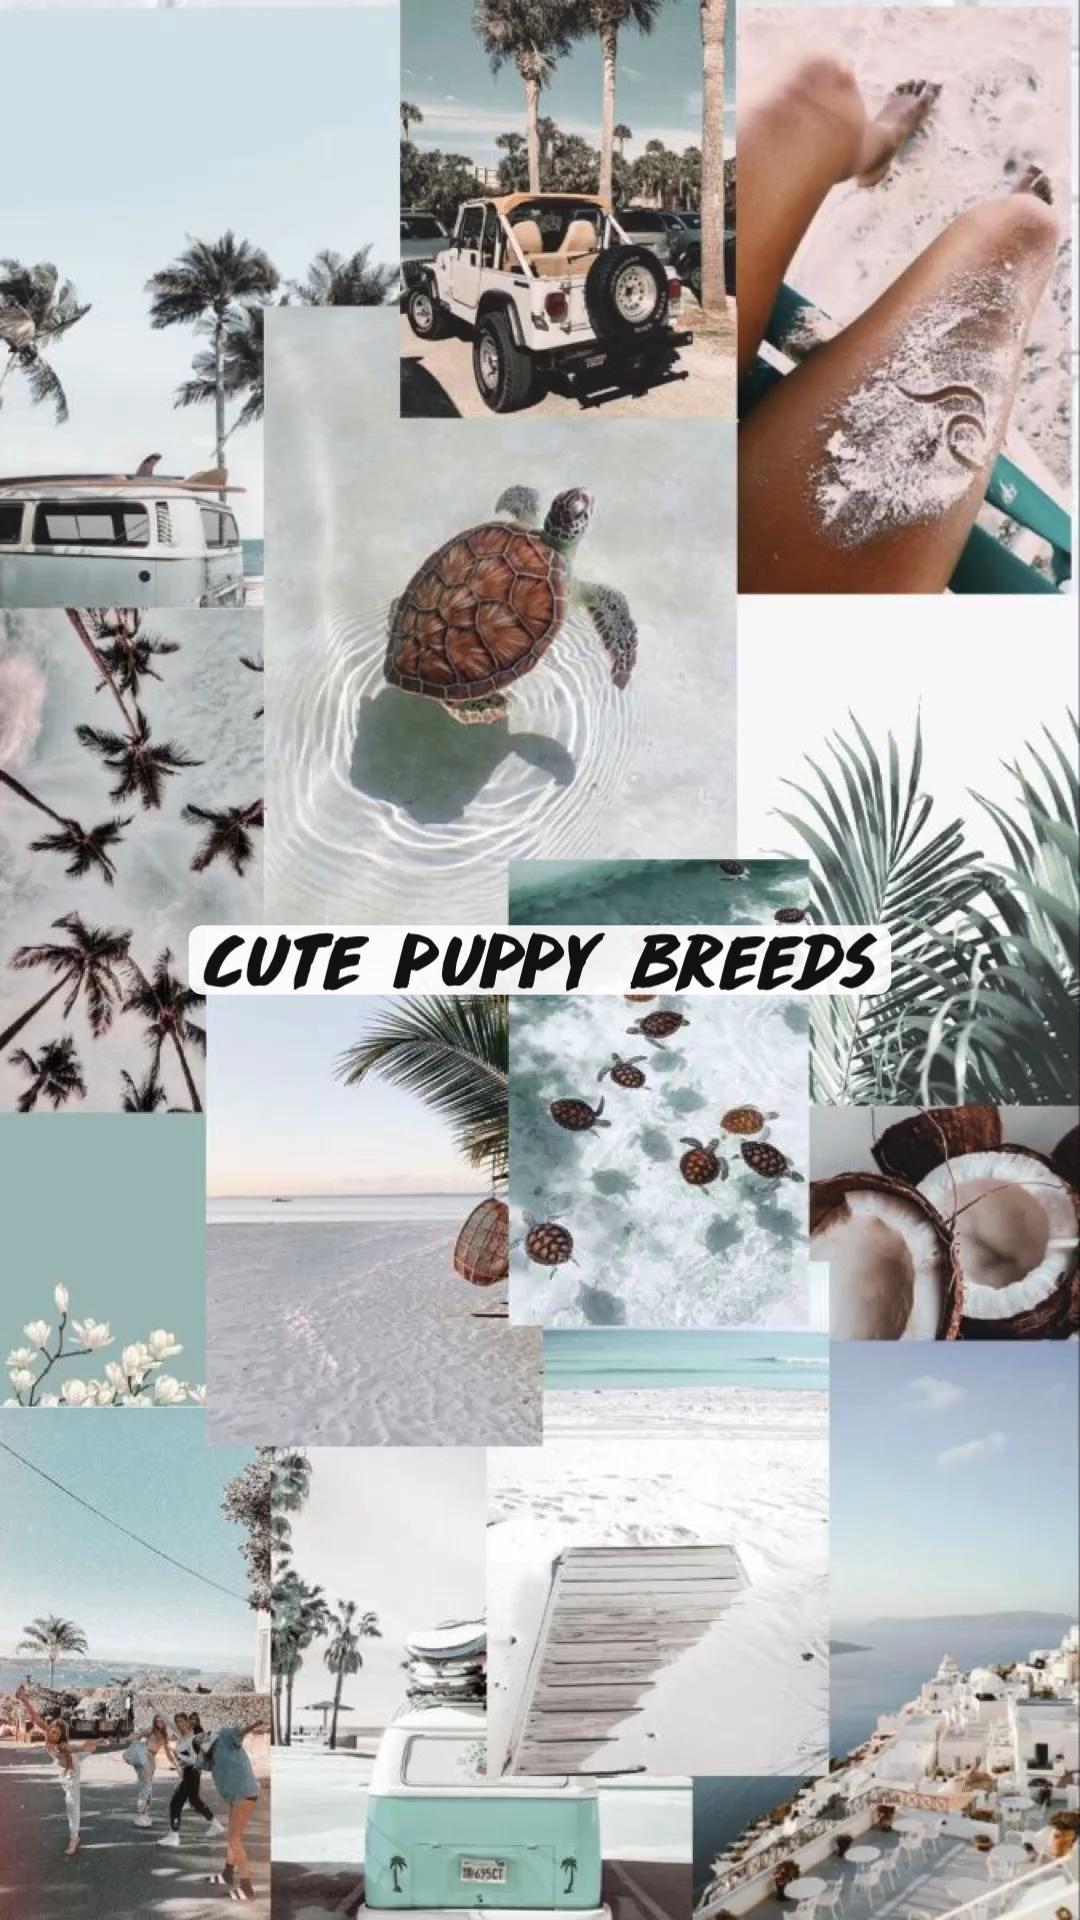 Cute puppy breeds